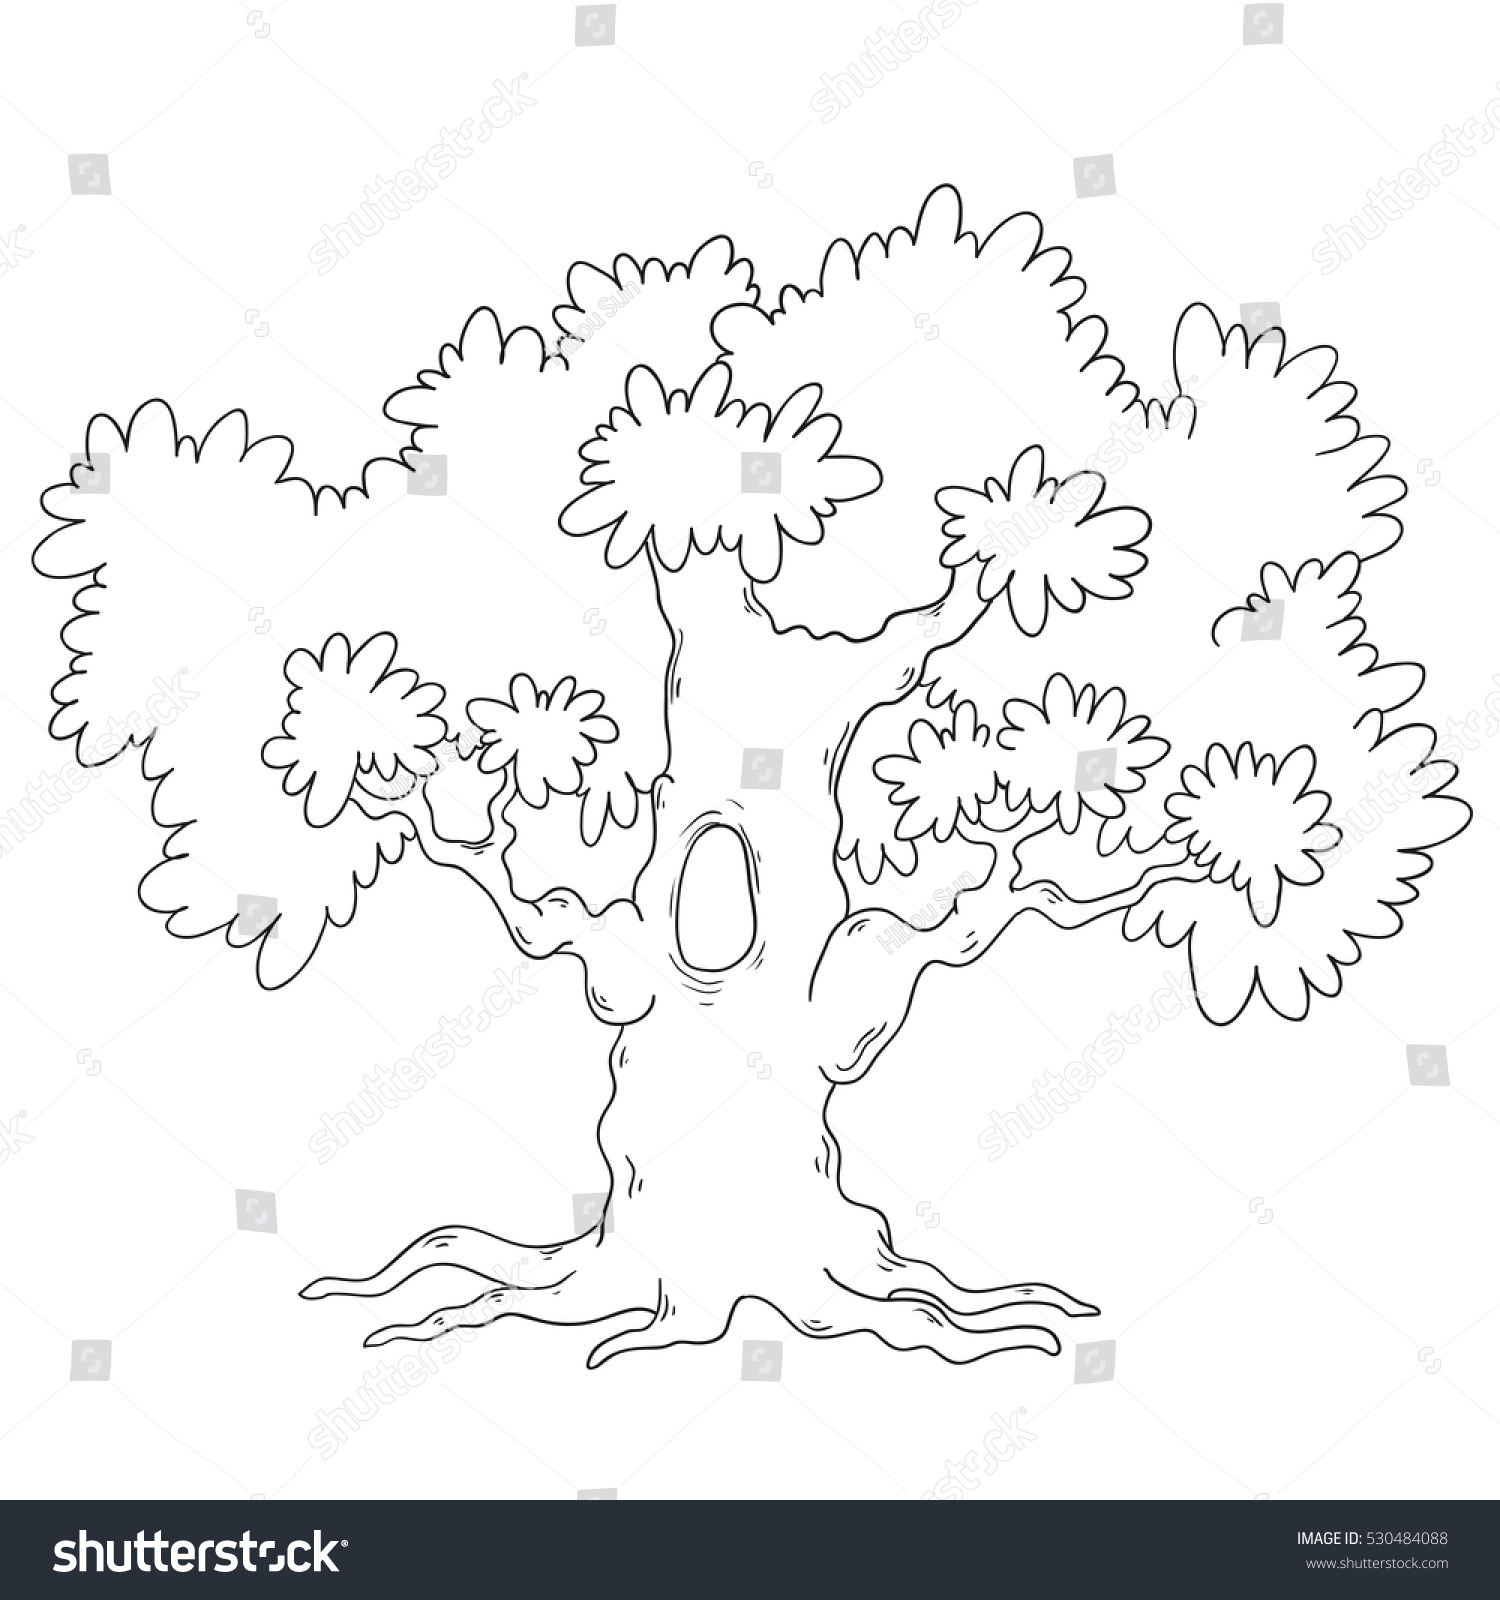 tree coloring book cartoon tree circuit stock vector 530484088 - Coloring Book Tree